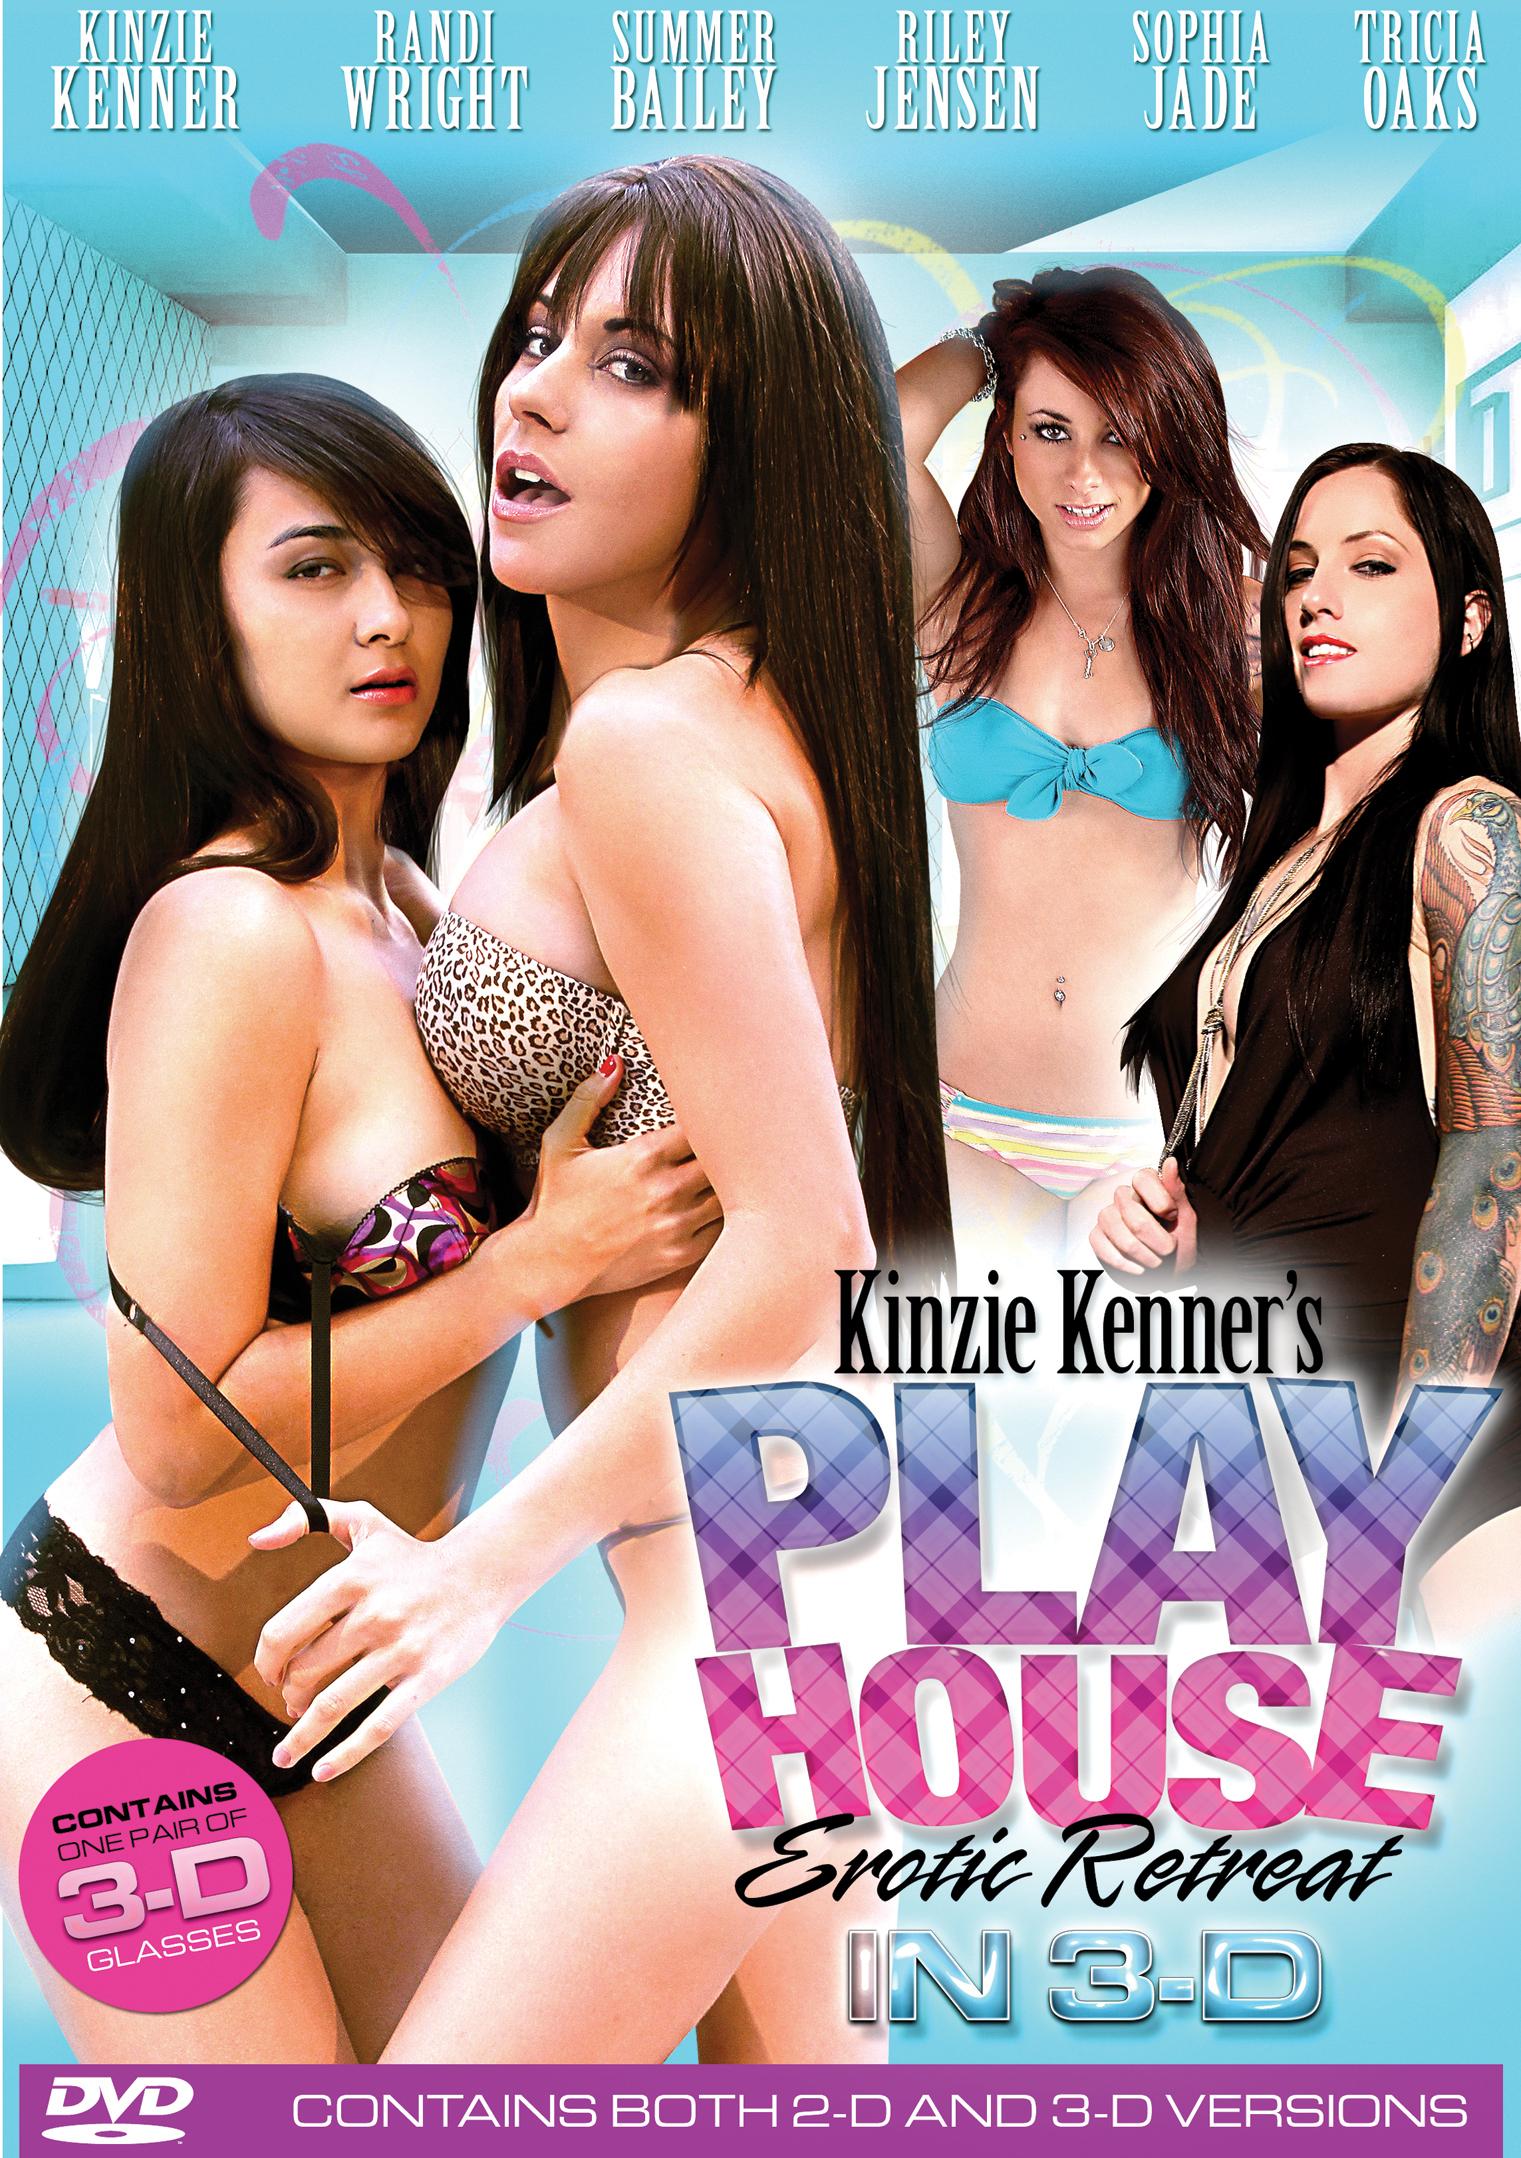 Kinzie Kenner's Pleasure Playhouse: Erotic Retreat